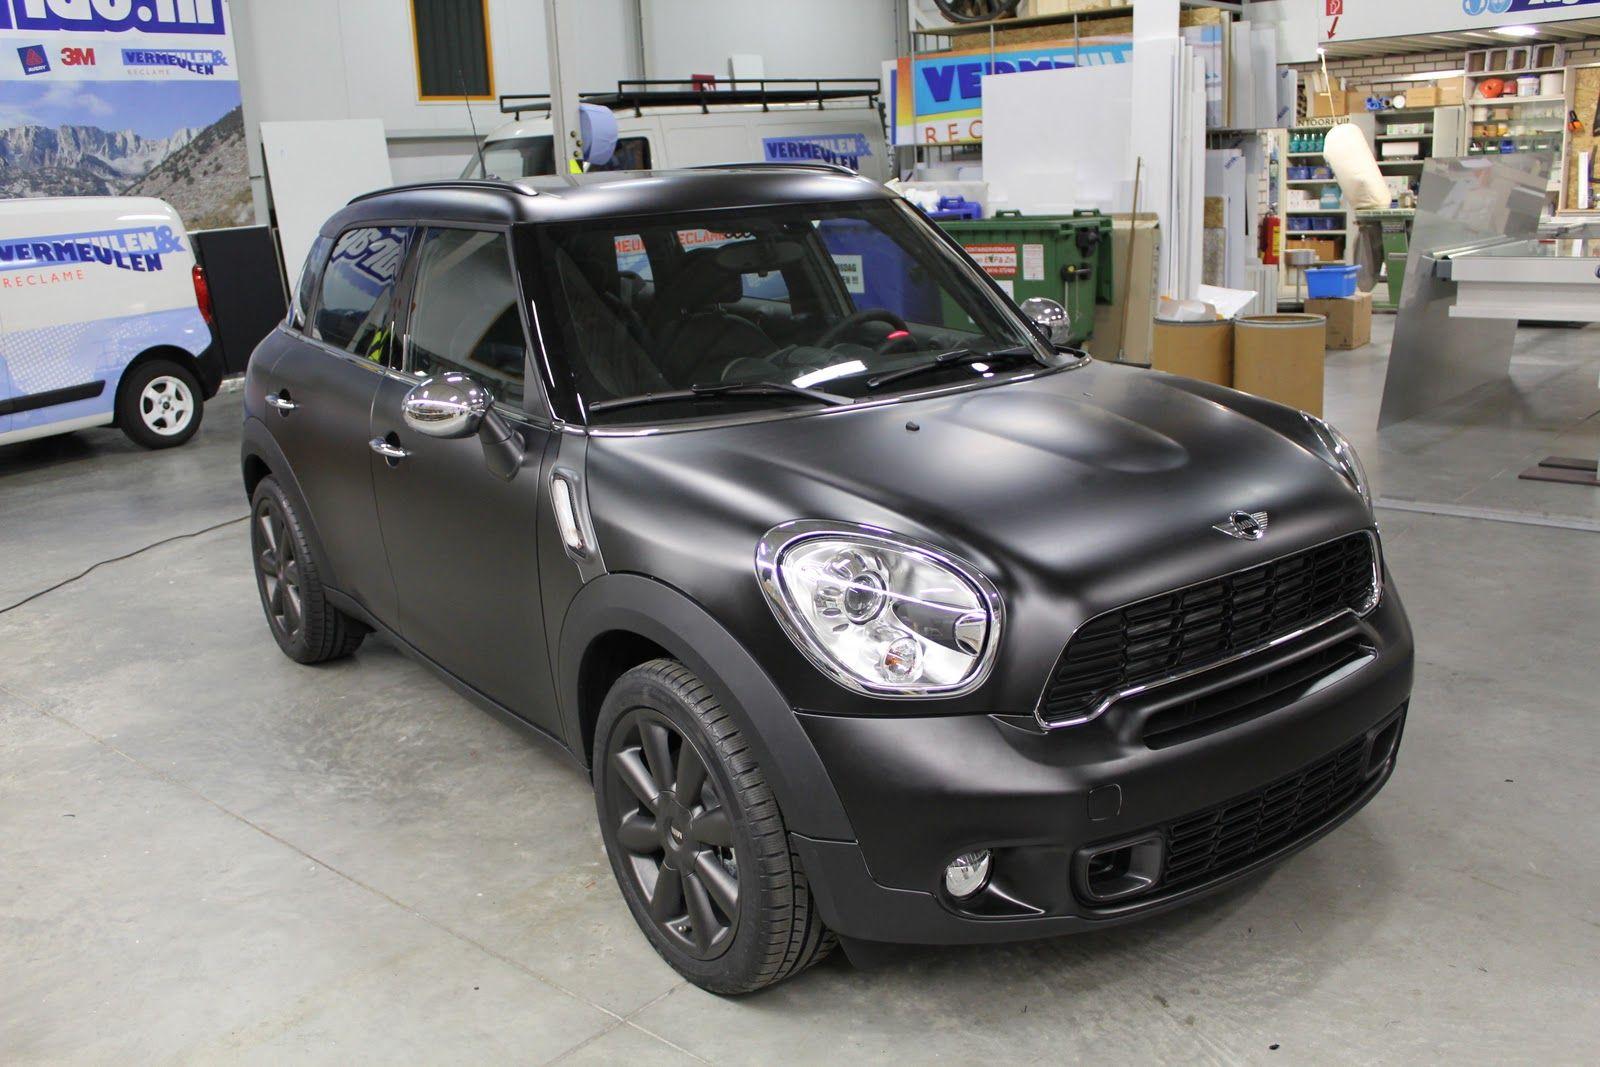 Mini mini cooper crossover : Mini Countryman matte black...I like the matte look - but not in ...